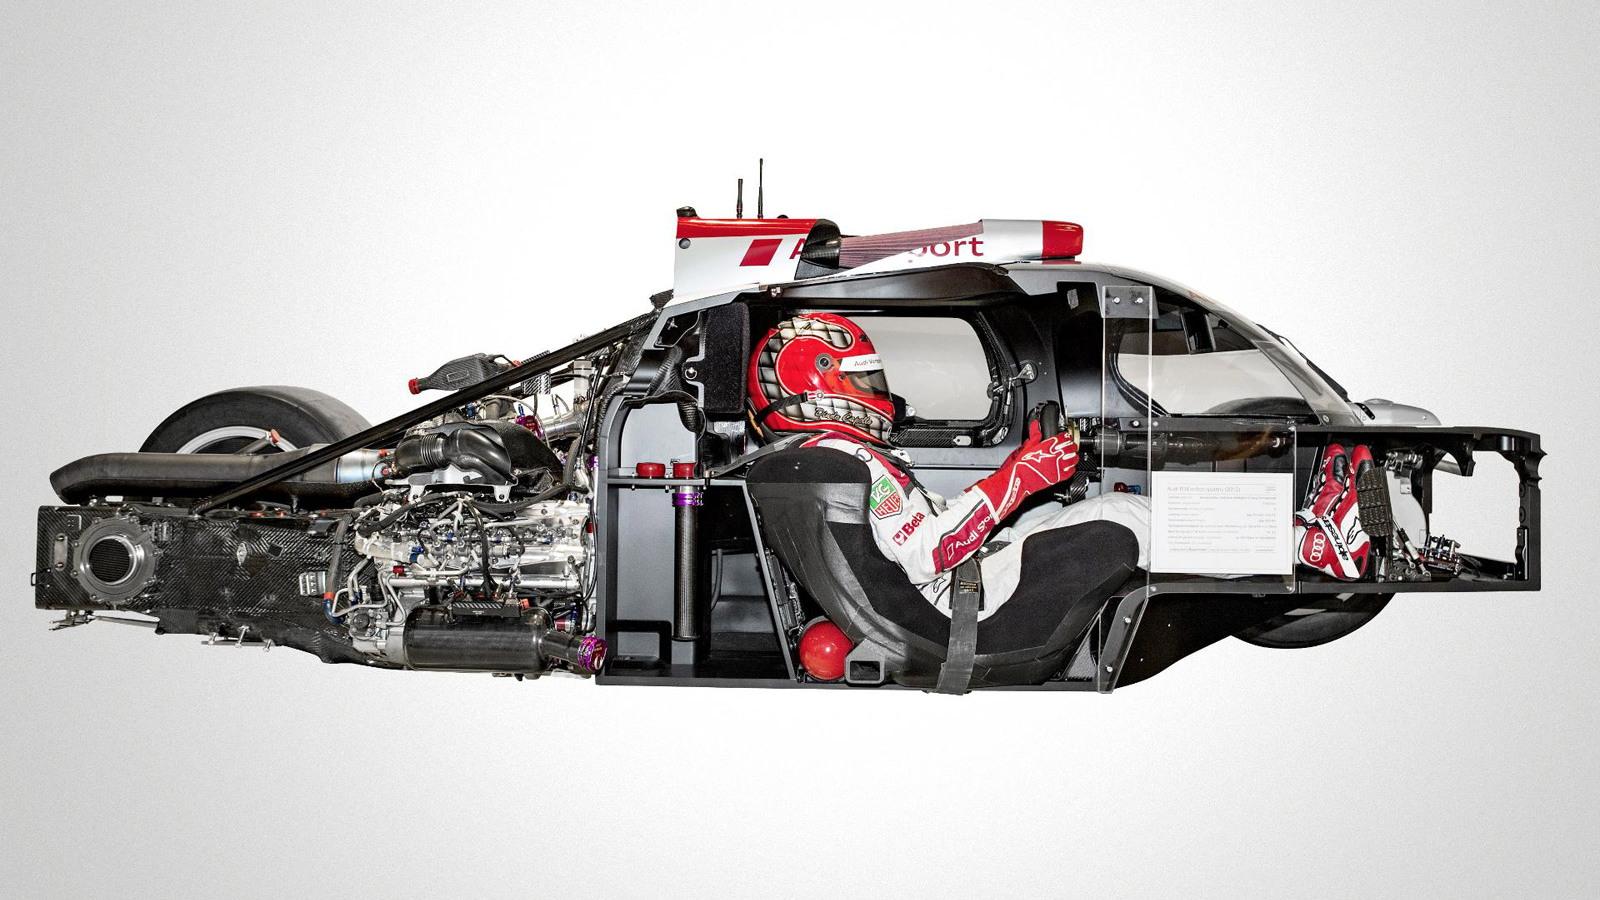 2012 Audi R18 e-tron quattro LMP1 race car